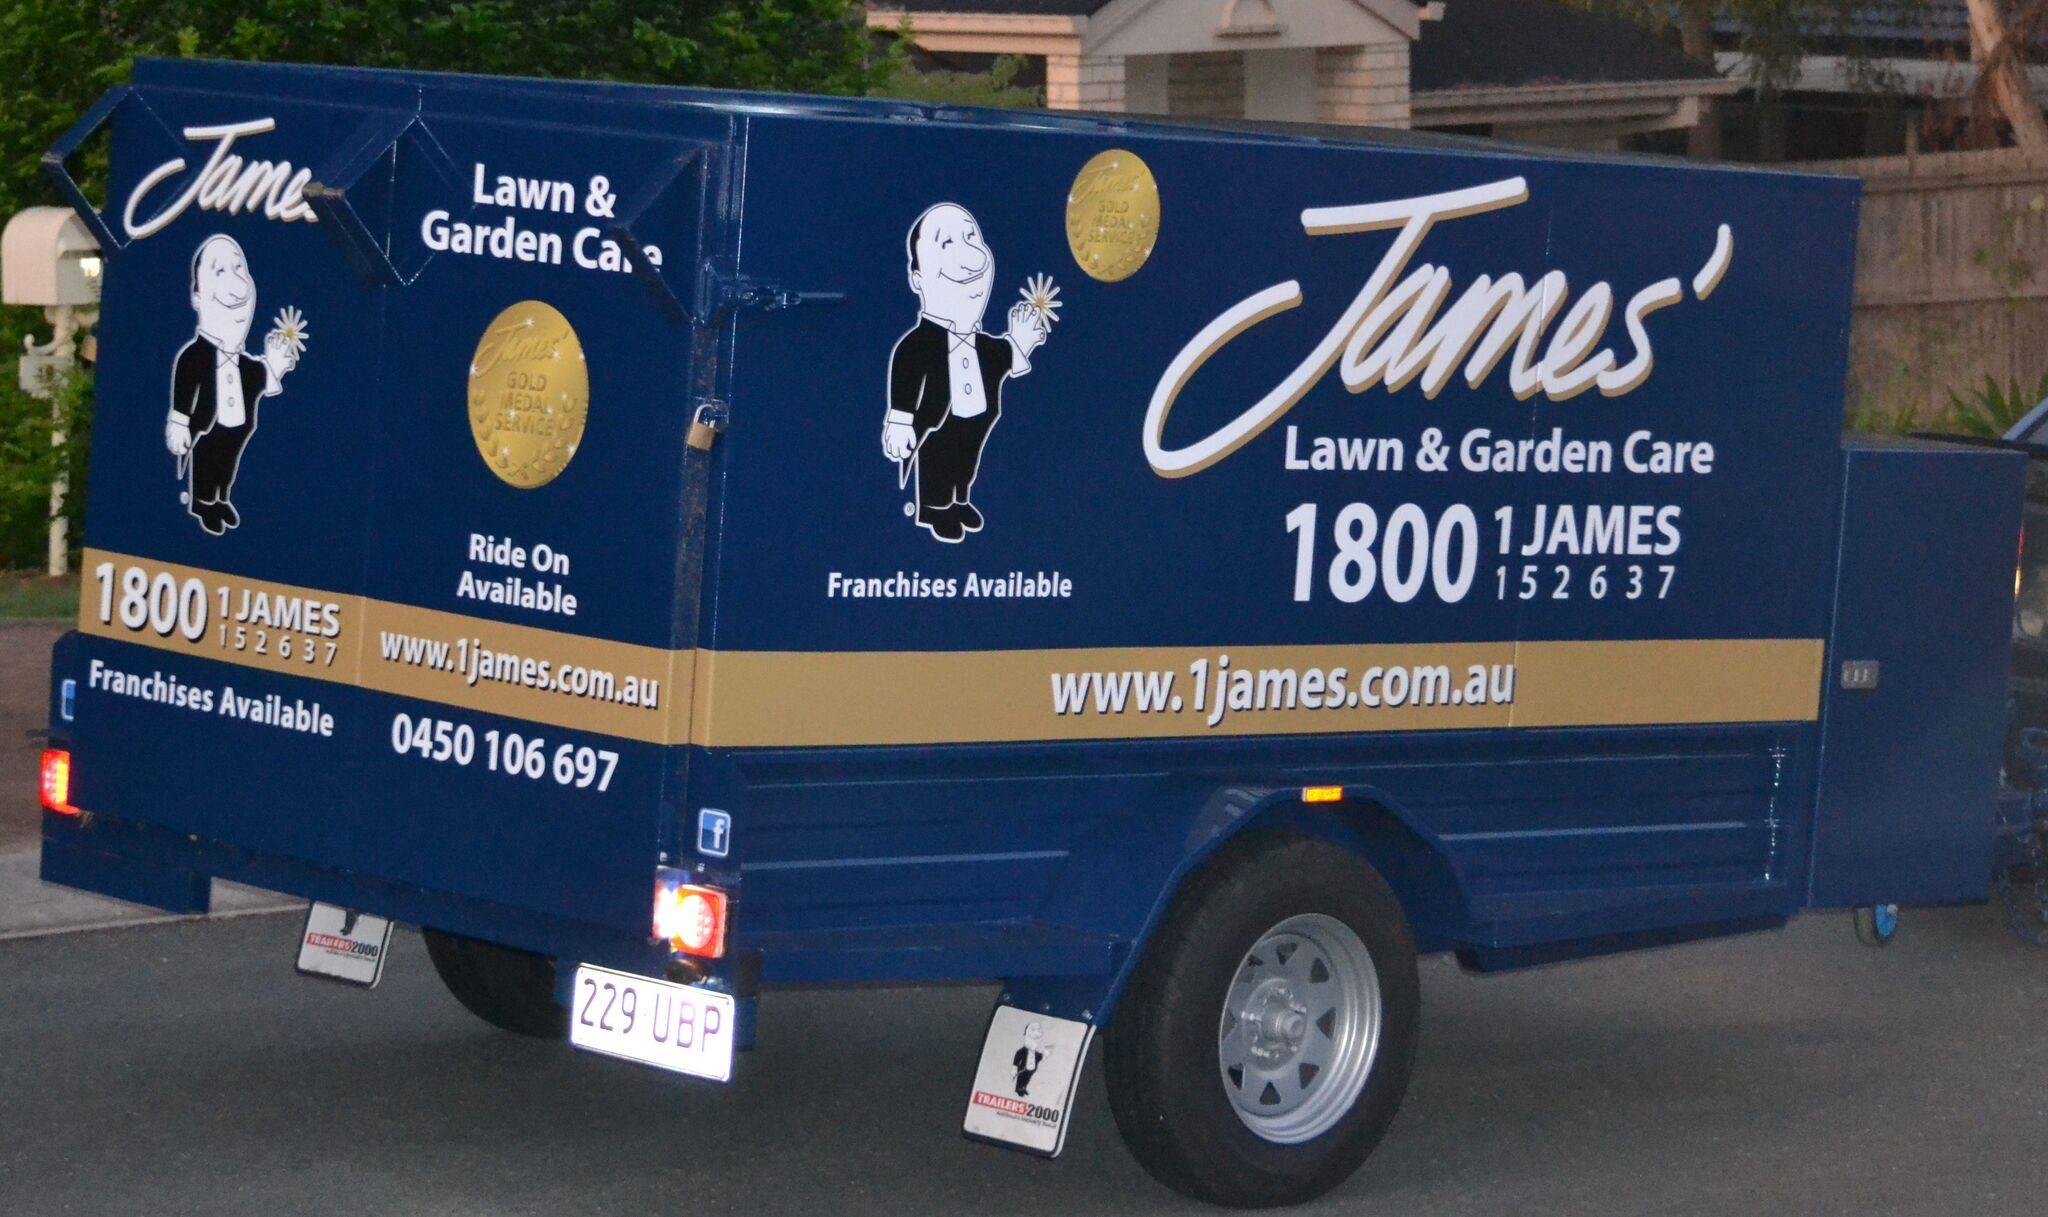 Enjoy the great outdoors! Lawn & garden opp. Flexible hrs, no experience needed